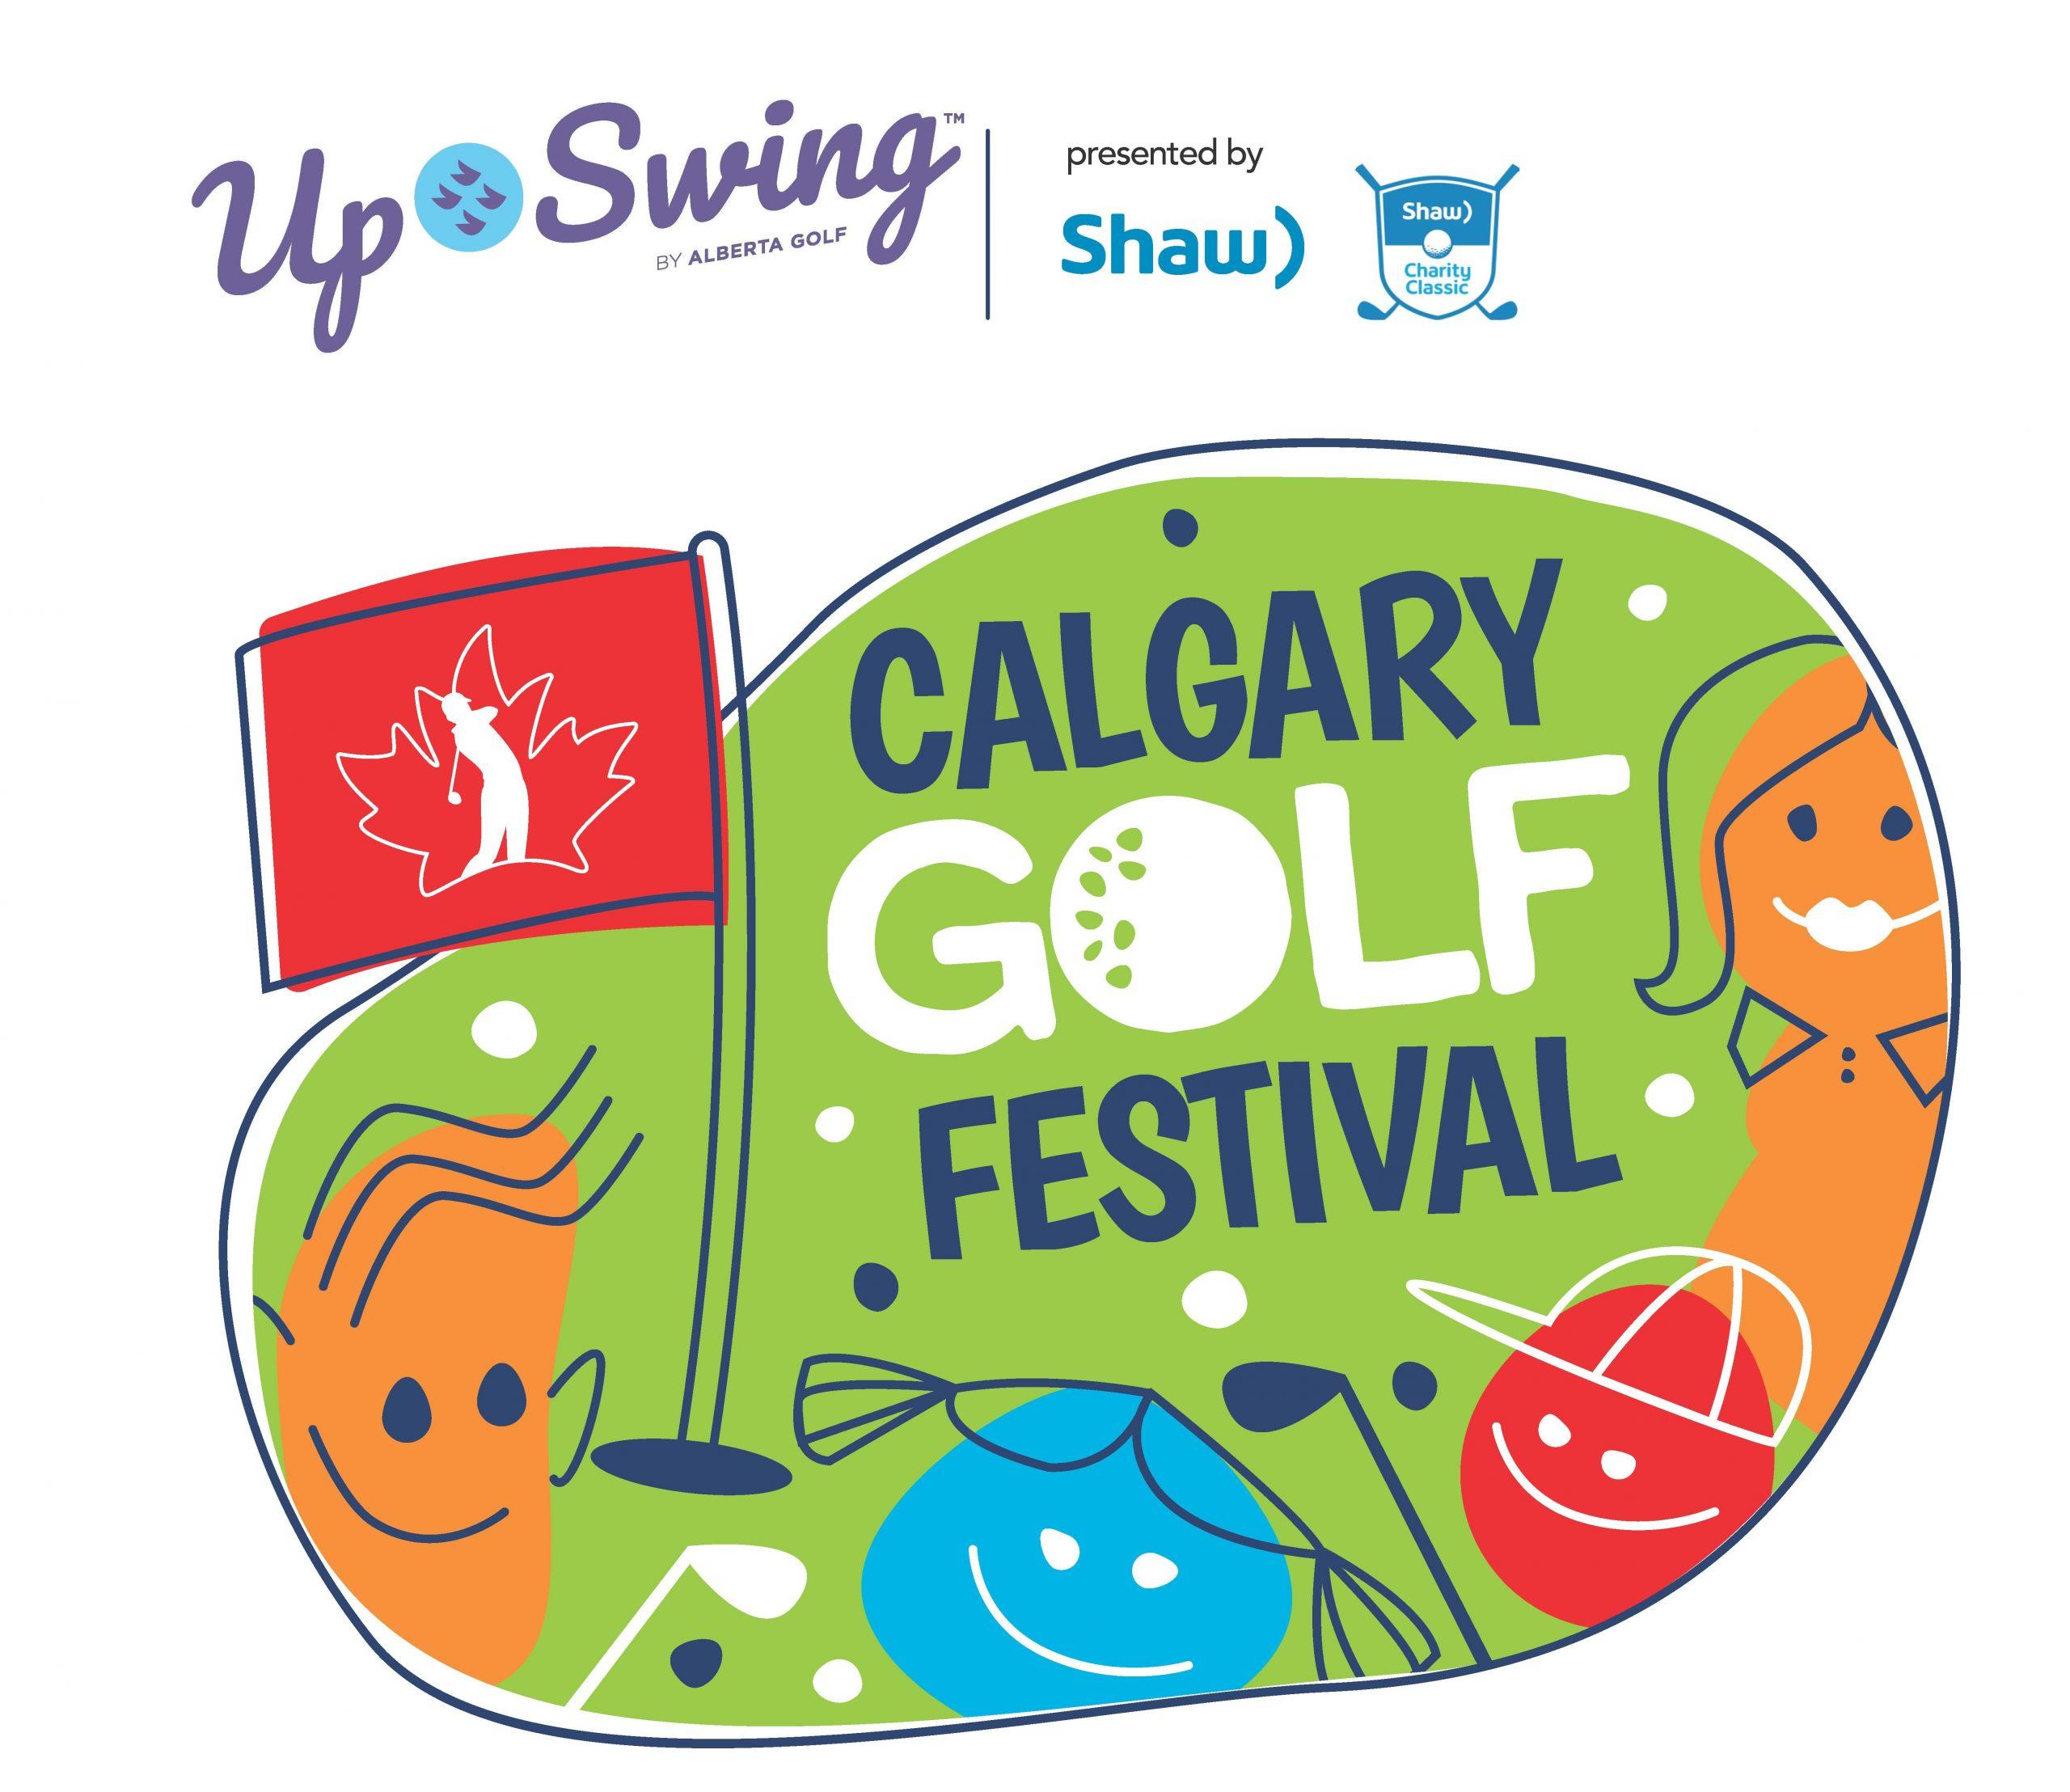 Calgary Golf Festival (Rent a Hole)